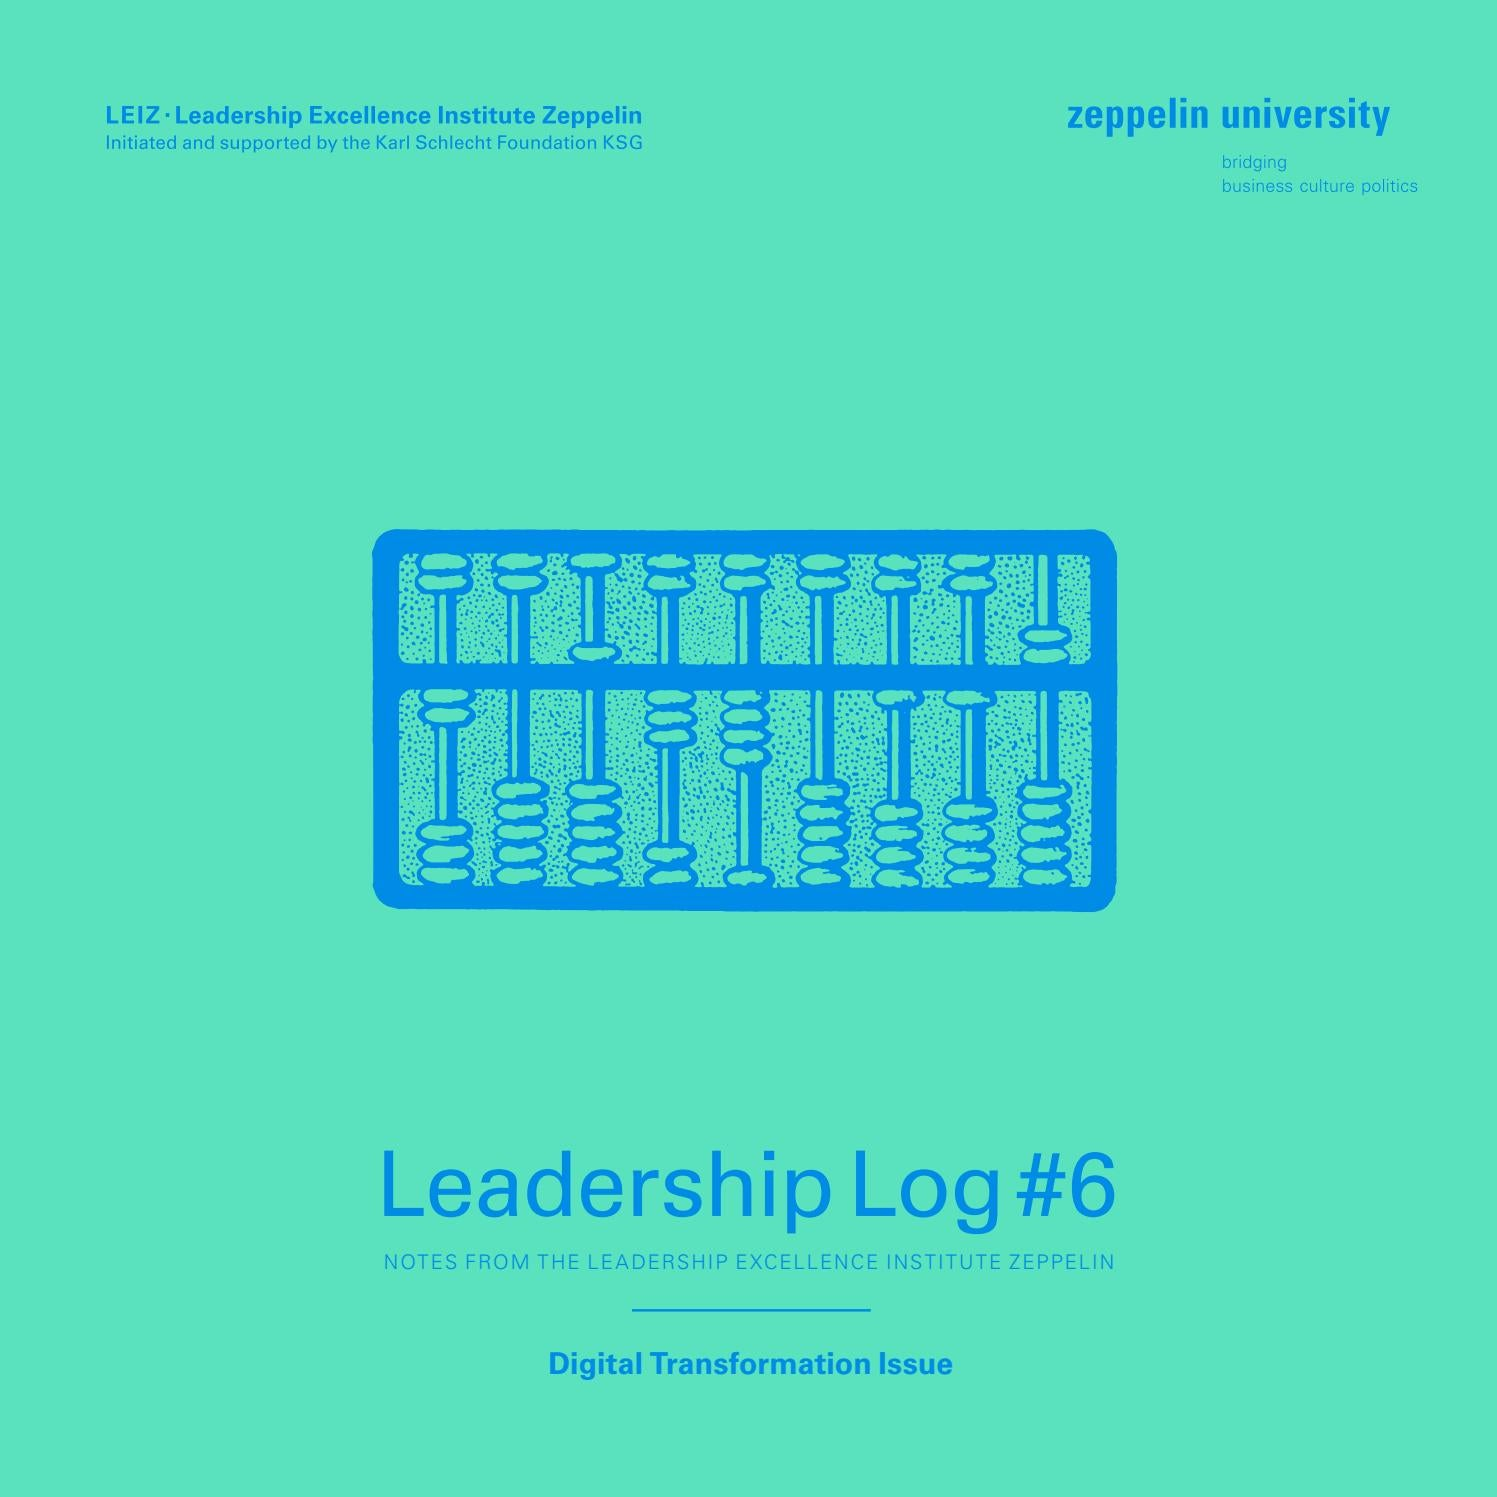 Zeppelin University | Leadership Log#6 by Zeppelin Universität - issuu